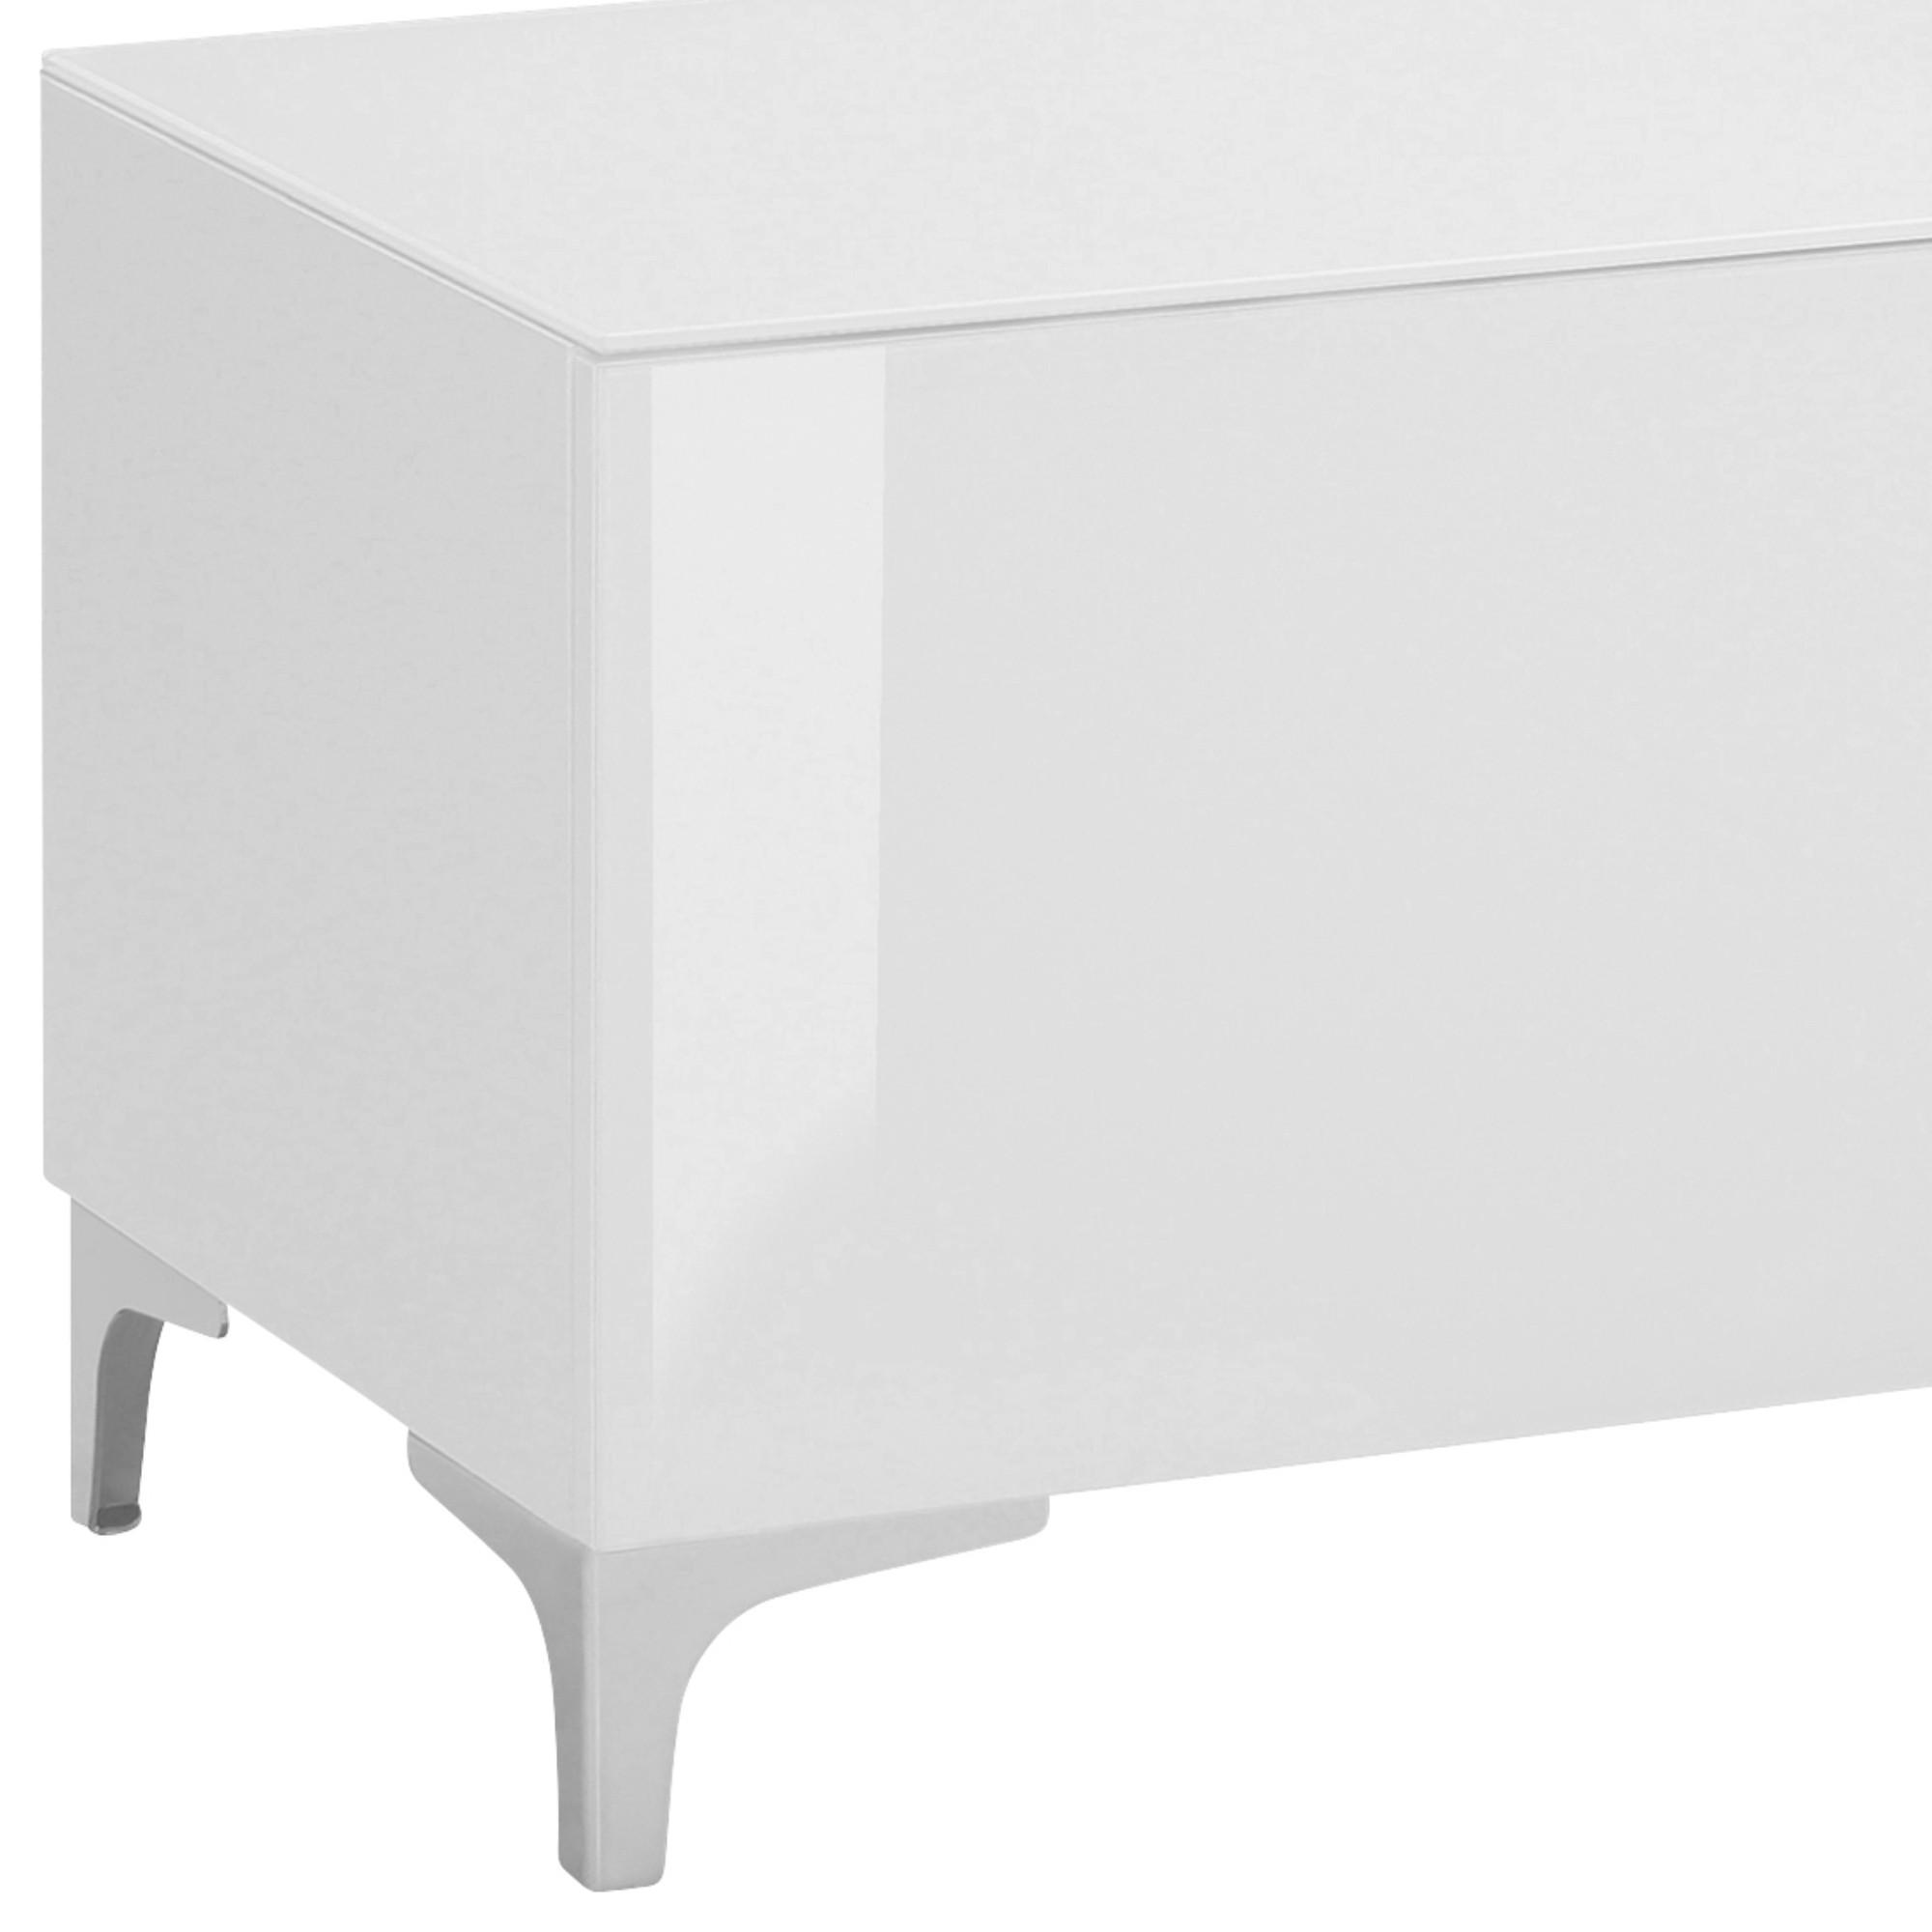 Sconto TV stolík BENTLEY biela matná/biele sklo, šírka 181 cm.